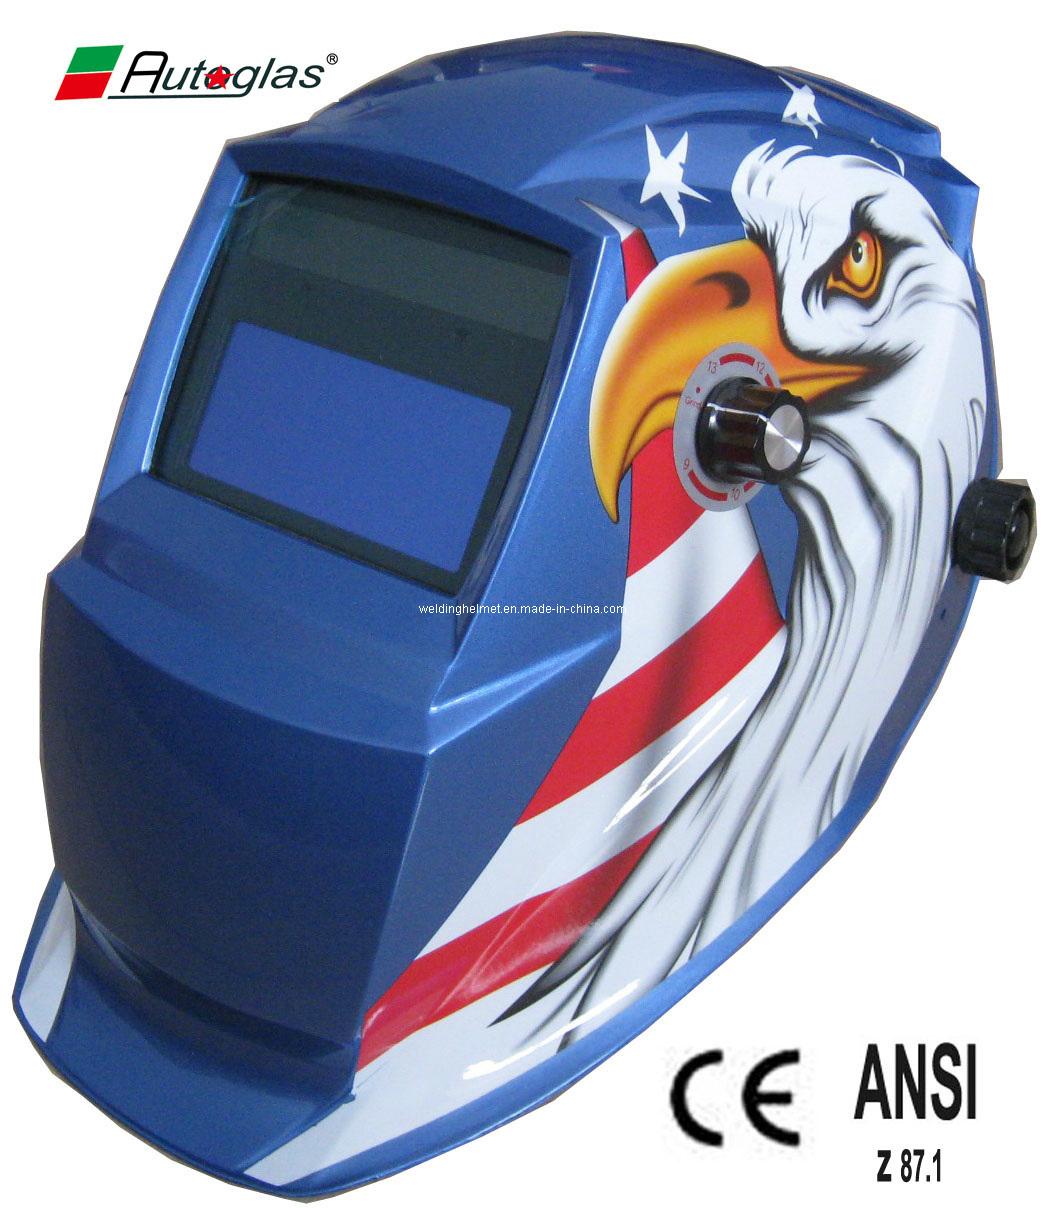 CE/ANSI, 9-13 Auto-Darkening Welding Helmet (F1190TE)